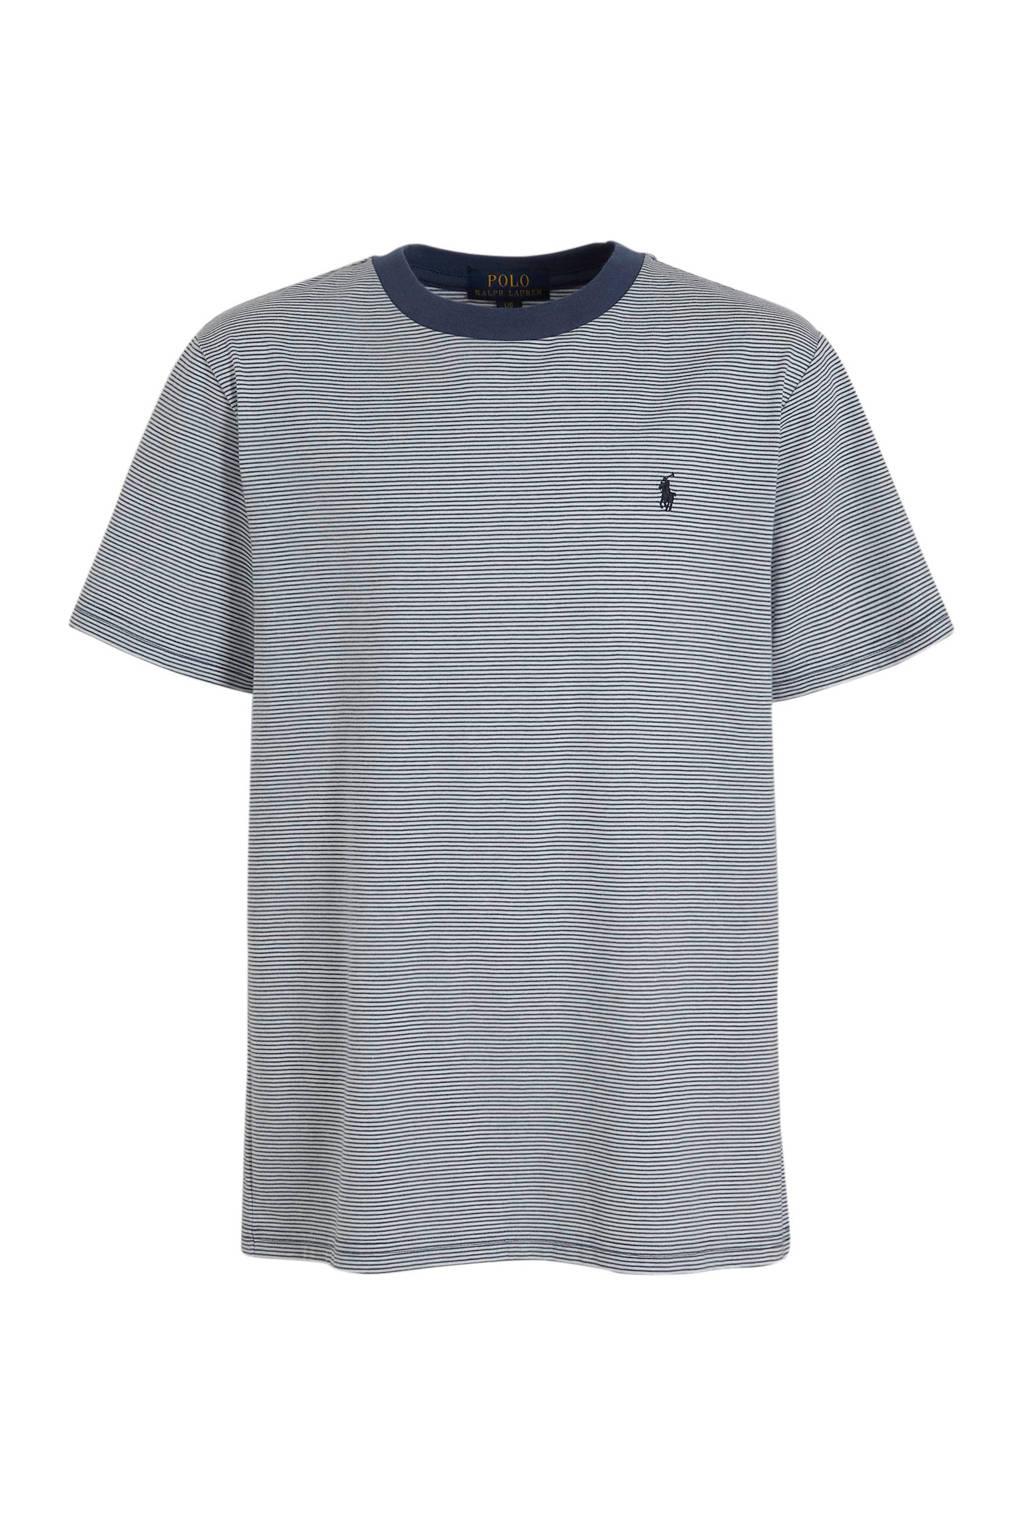 POLO Ralph Lauren gestreept T-shirt donkerblauw/wit, Donkerblauw/wit